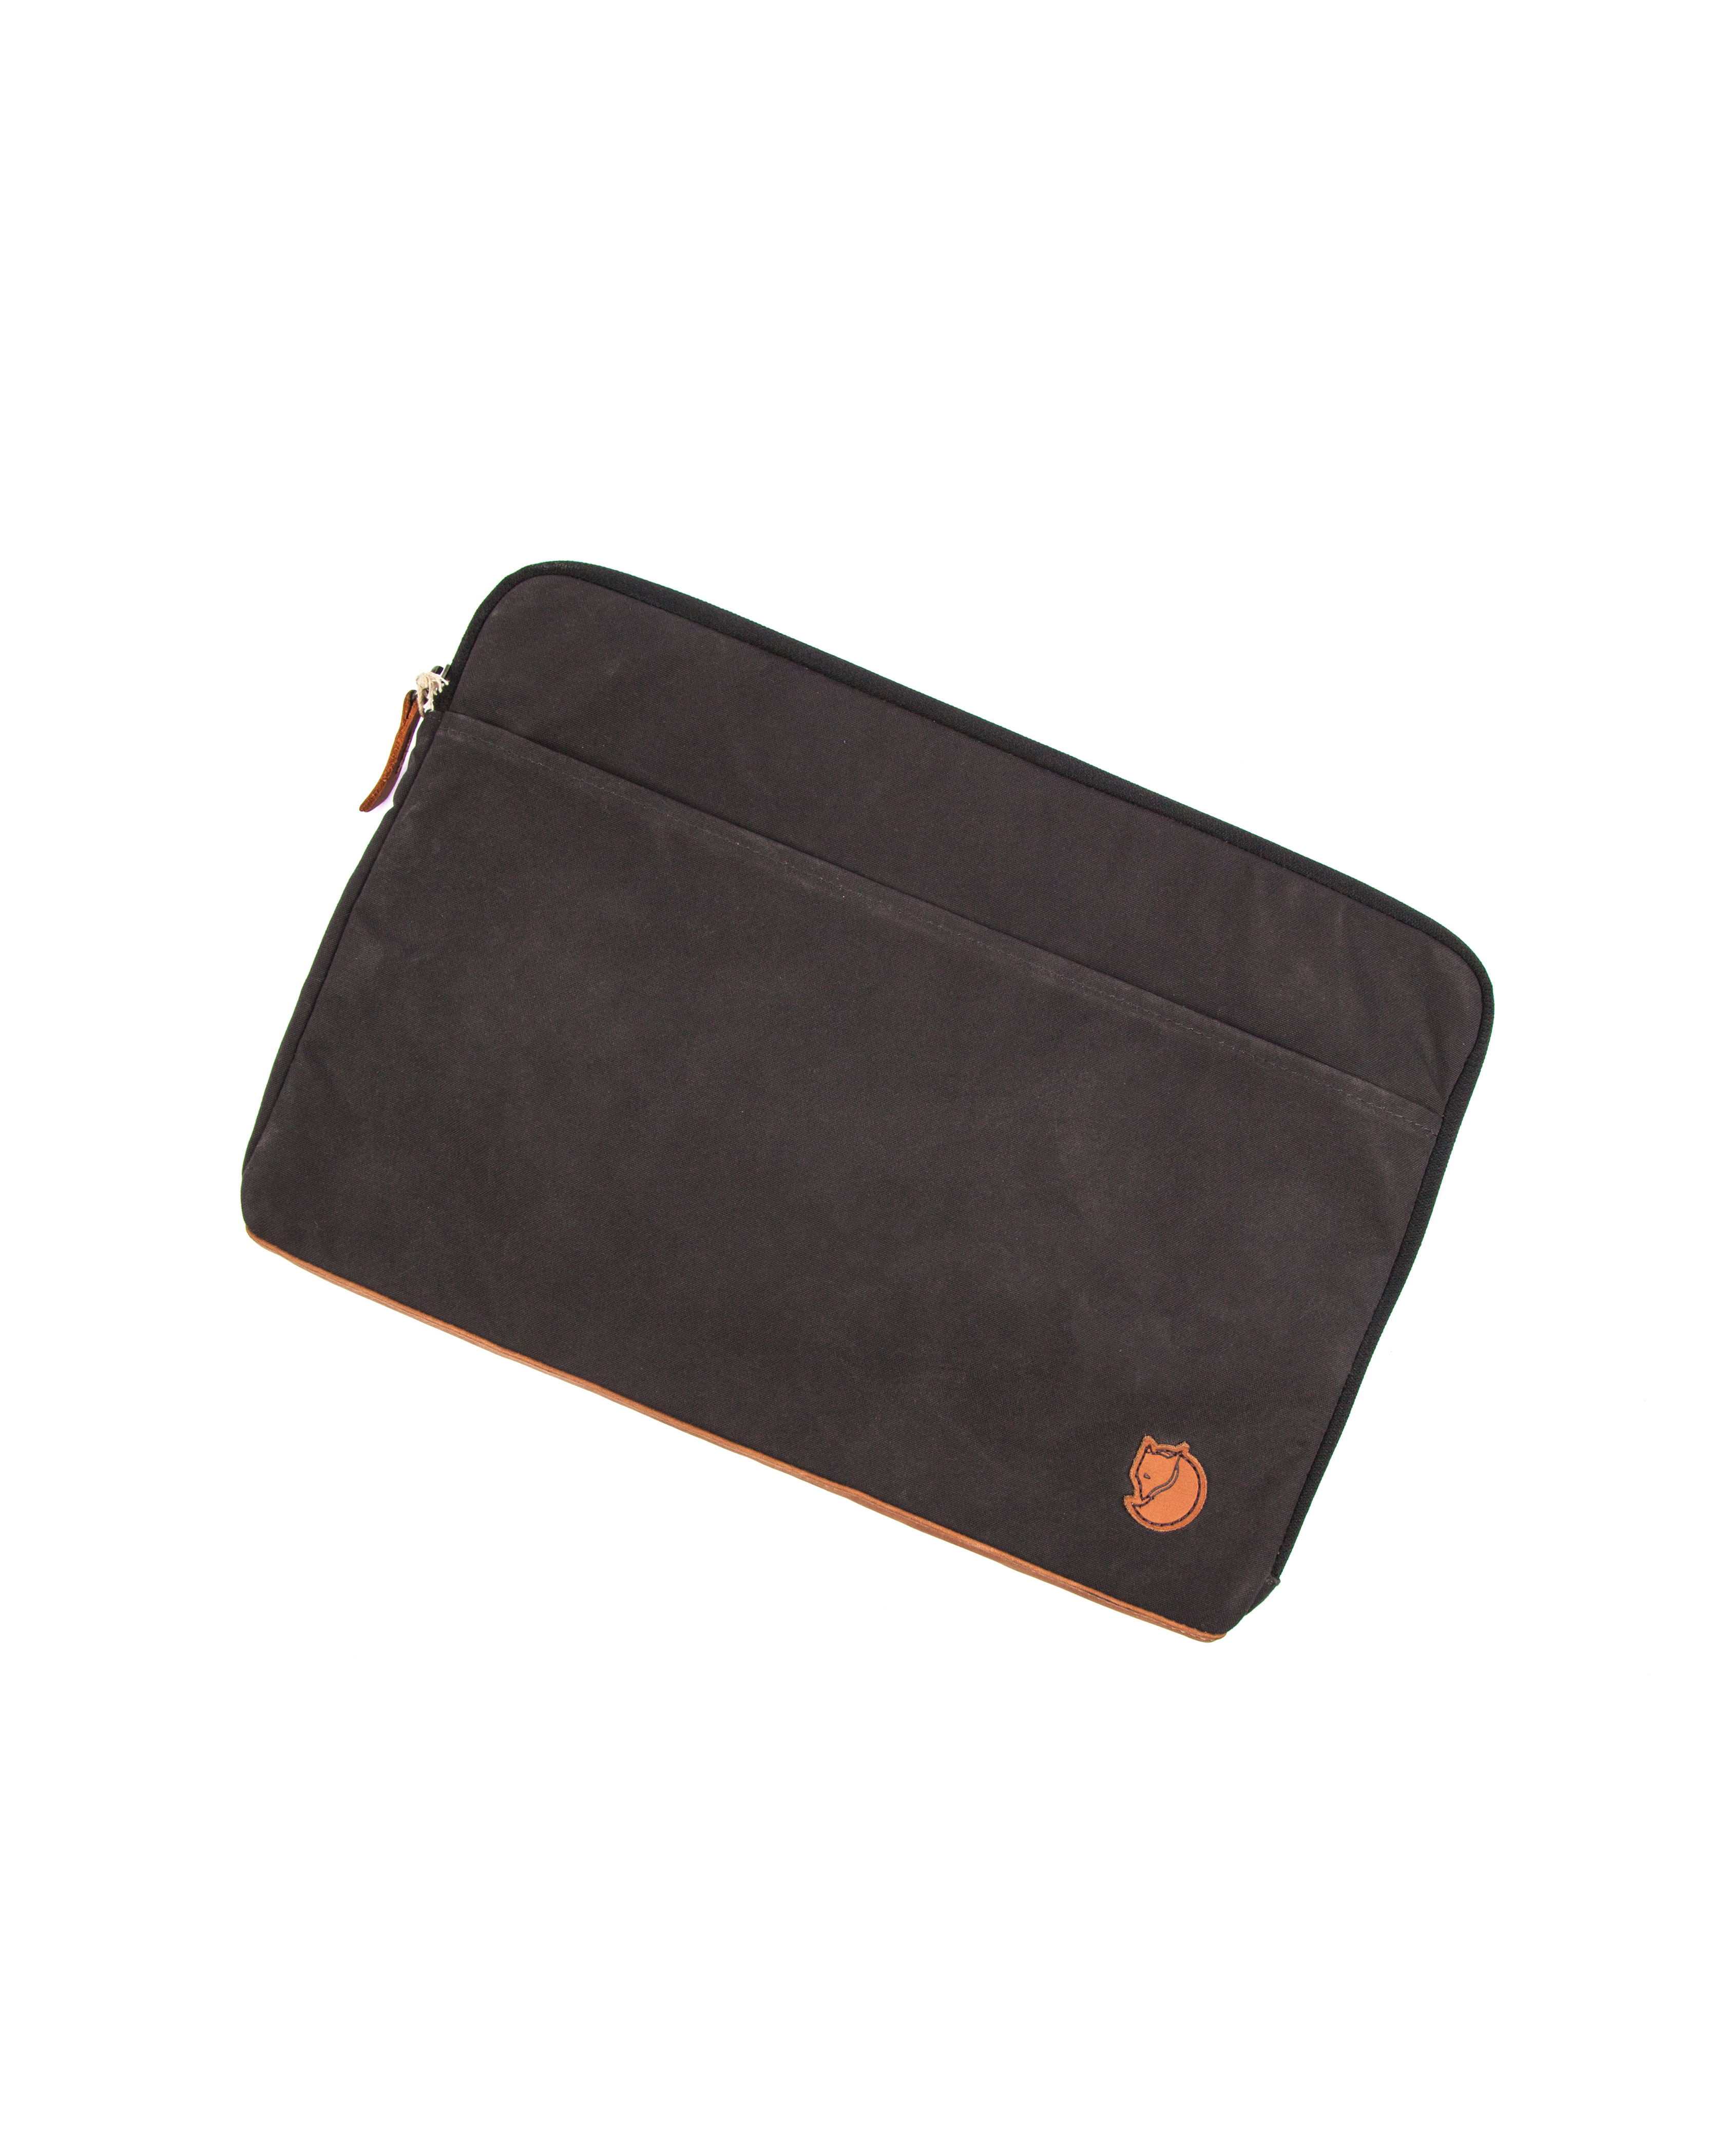 Чехол Fjallraven Laptop '15 G-1000 Brown Case